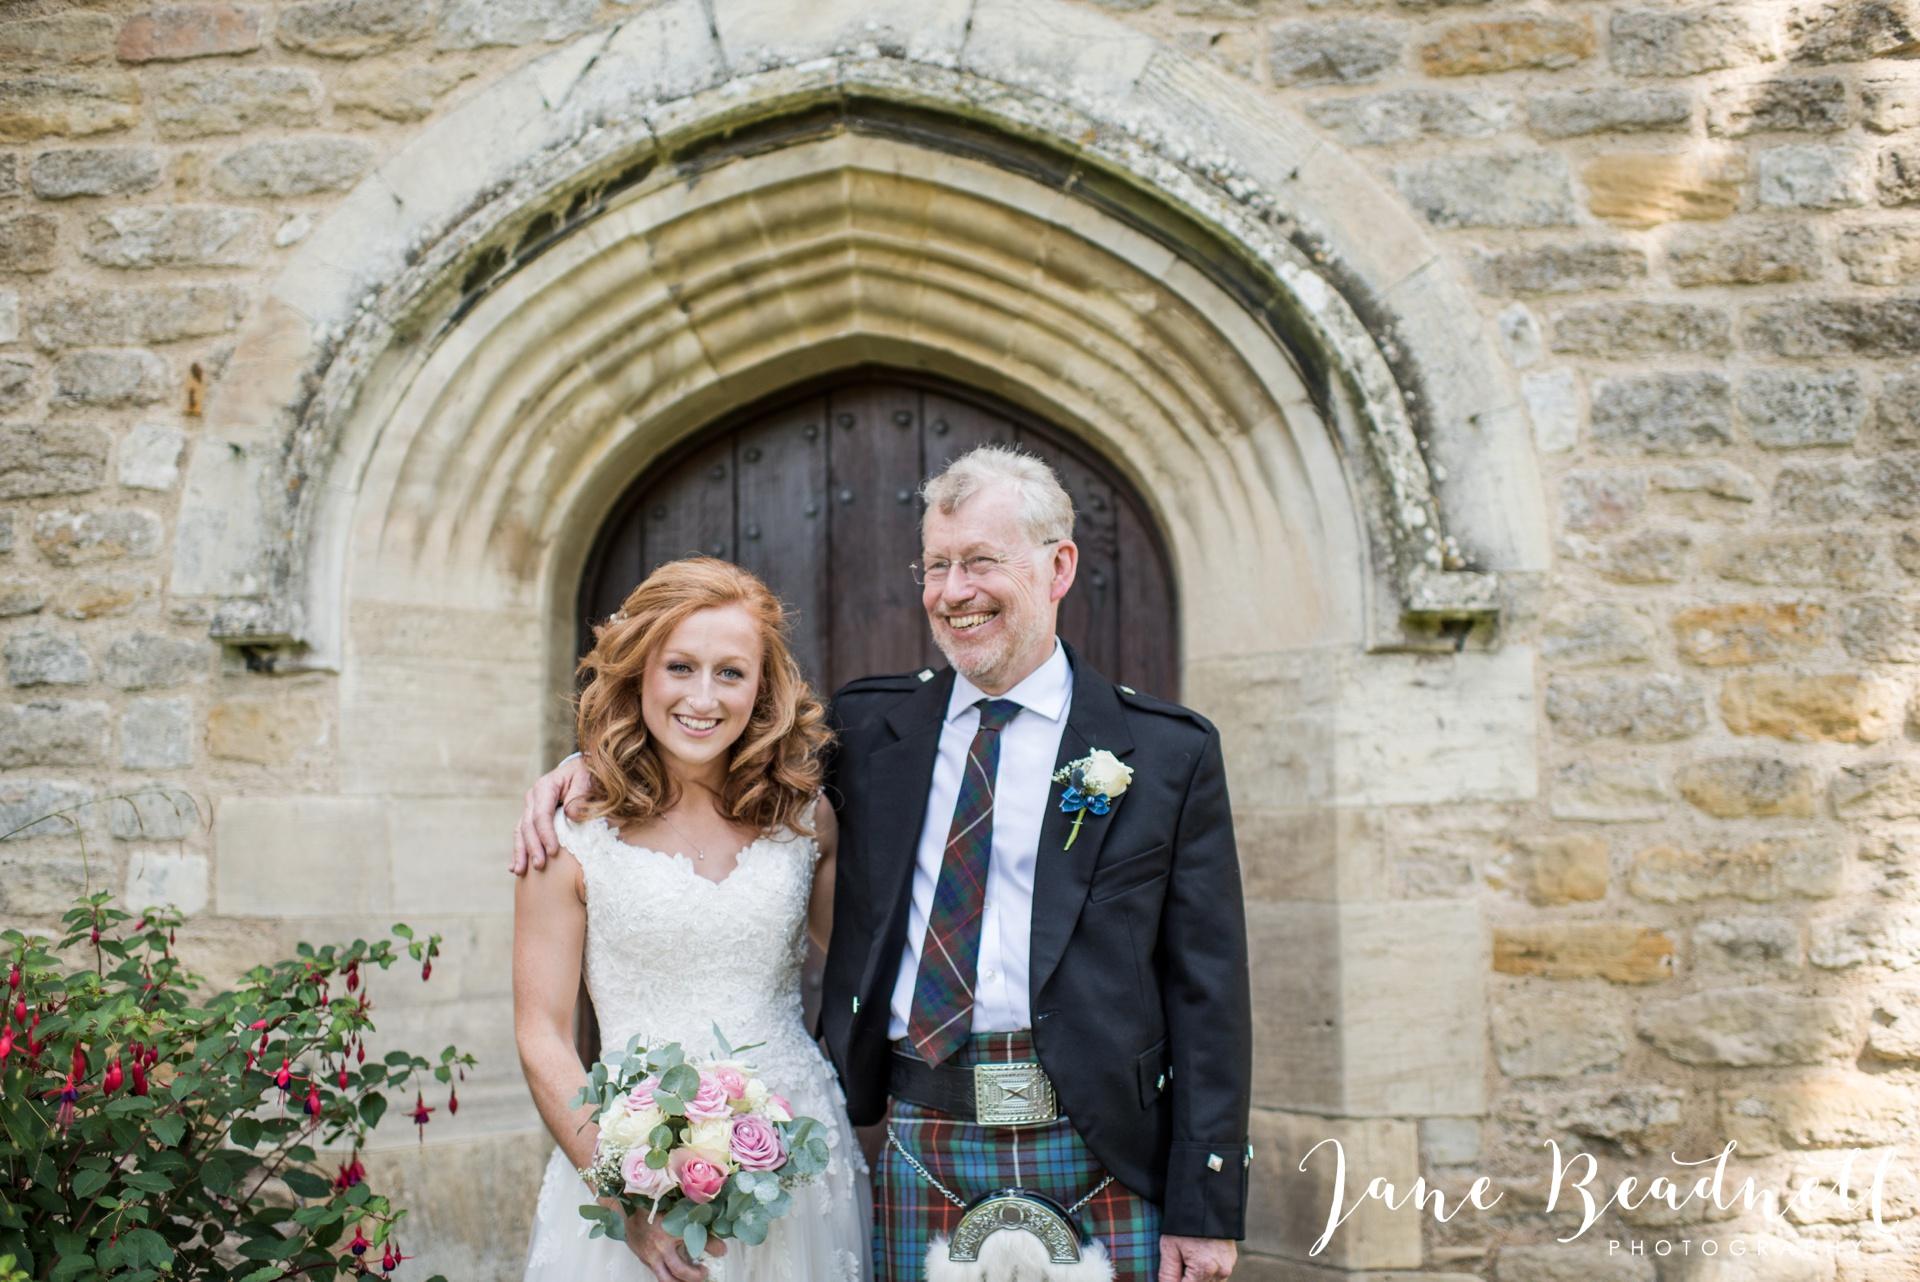 yorkshire-fine-art-wedding-photographer-jane-beadnell-photography-poppleton-york_0038